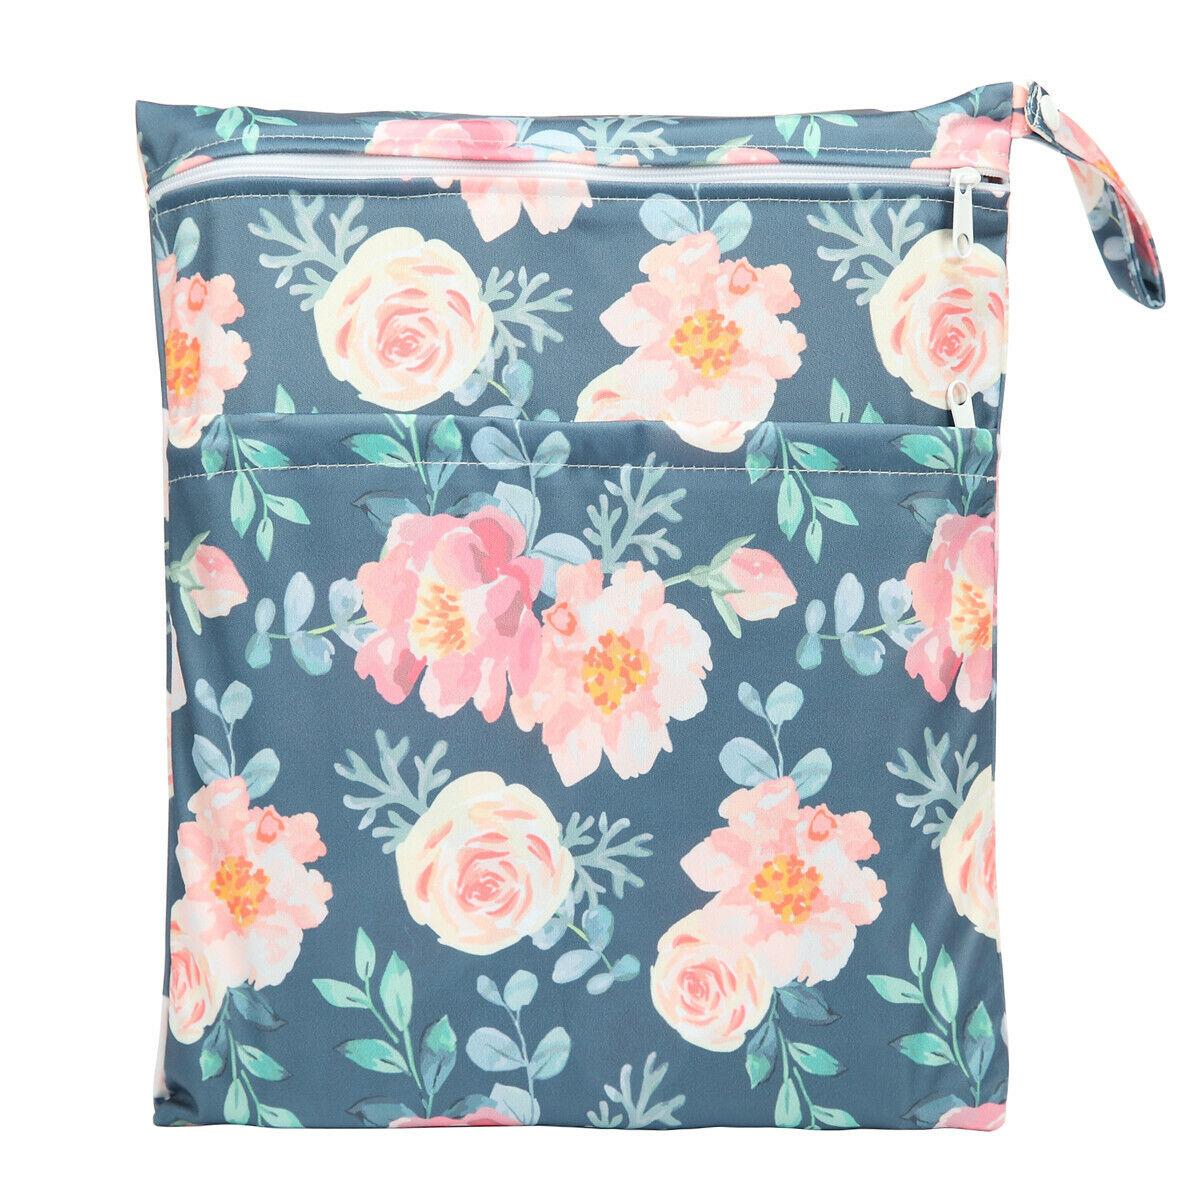 Details About Wet Dry Bag Baby Cloth Diaper Ny Reusable 2 Zipper Pocket Fl S